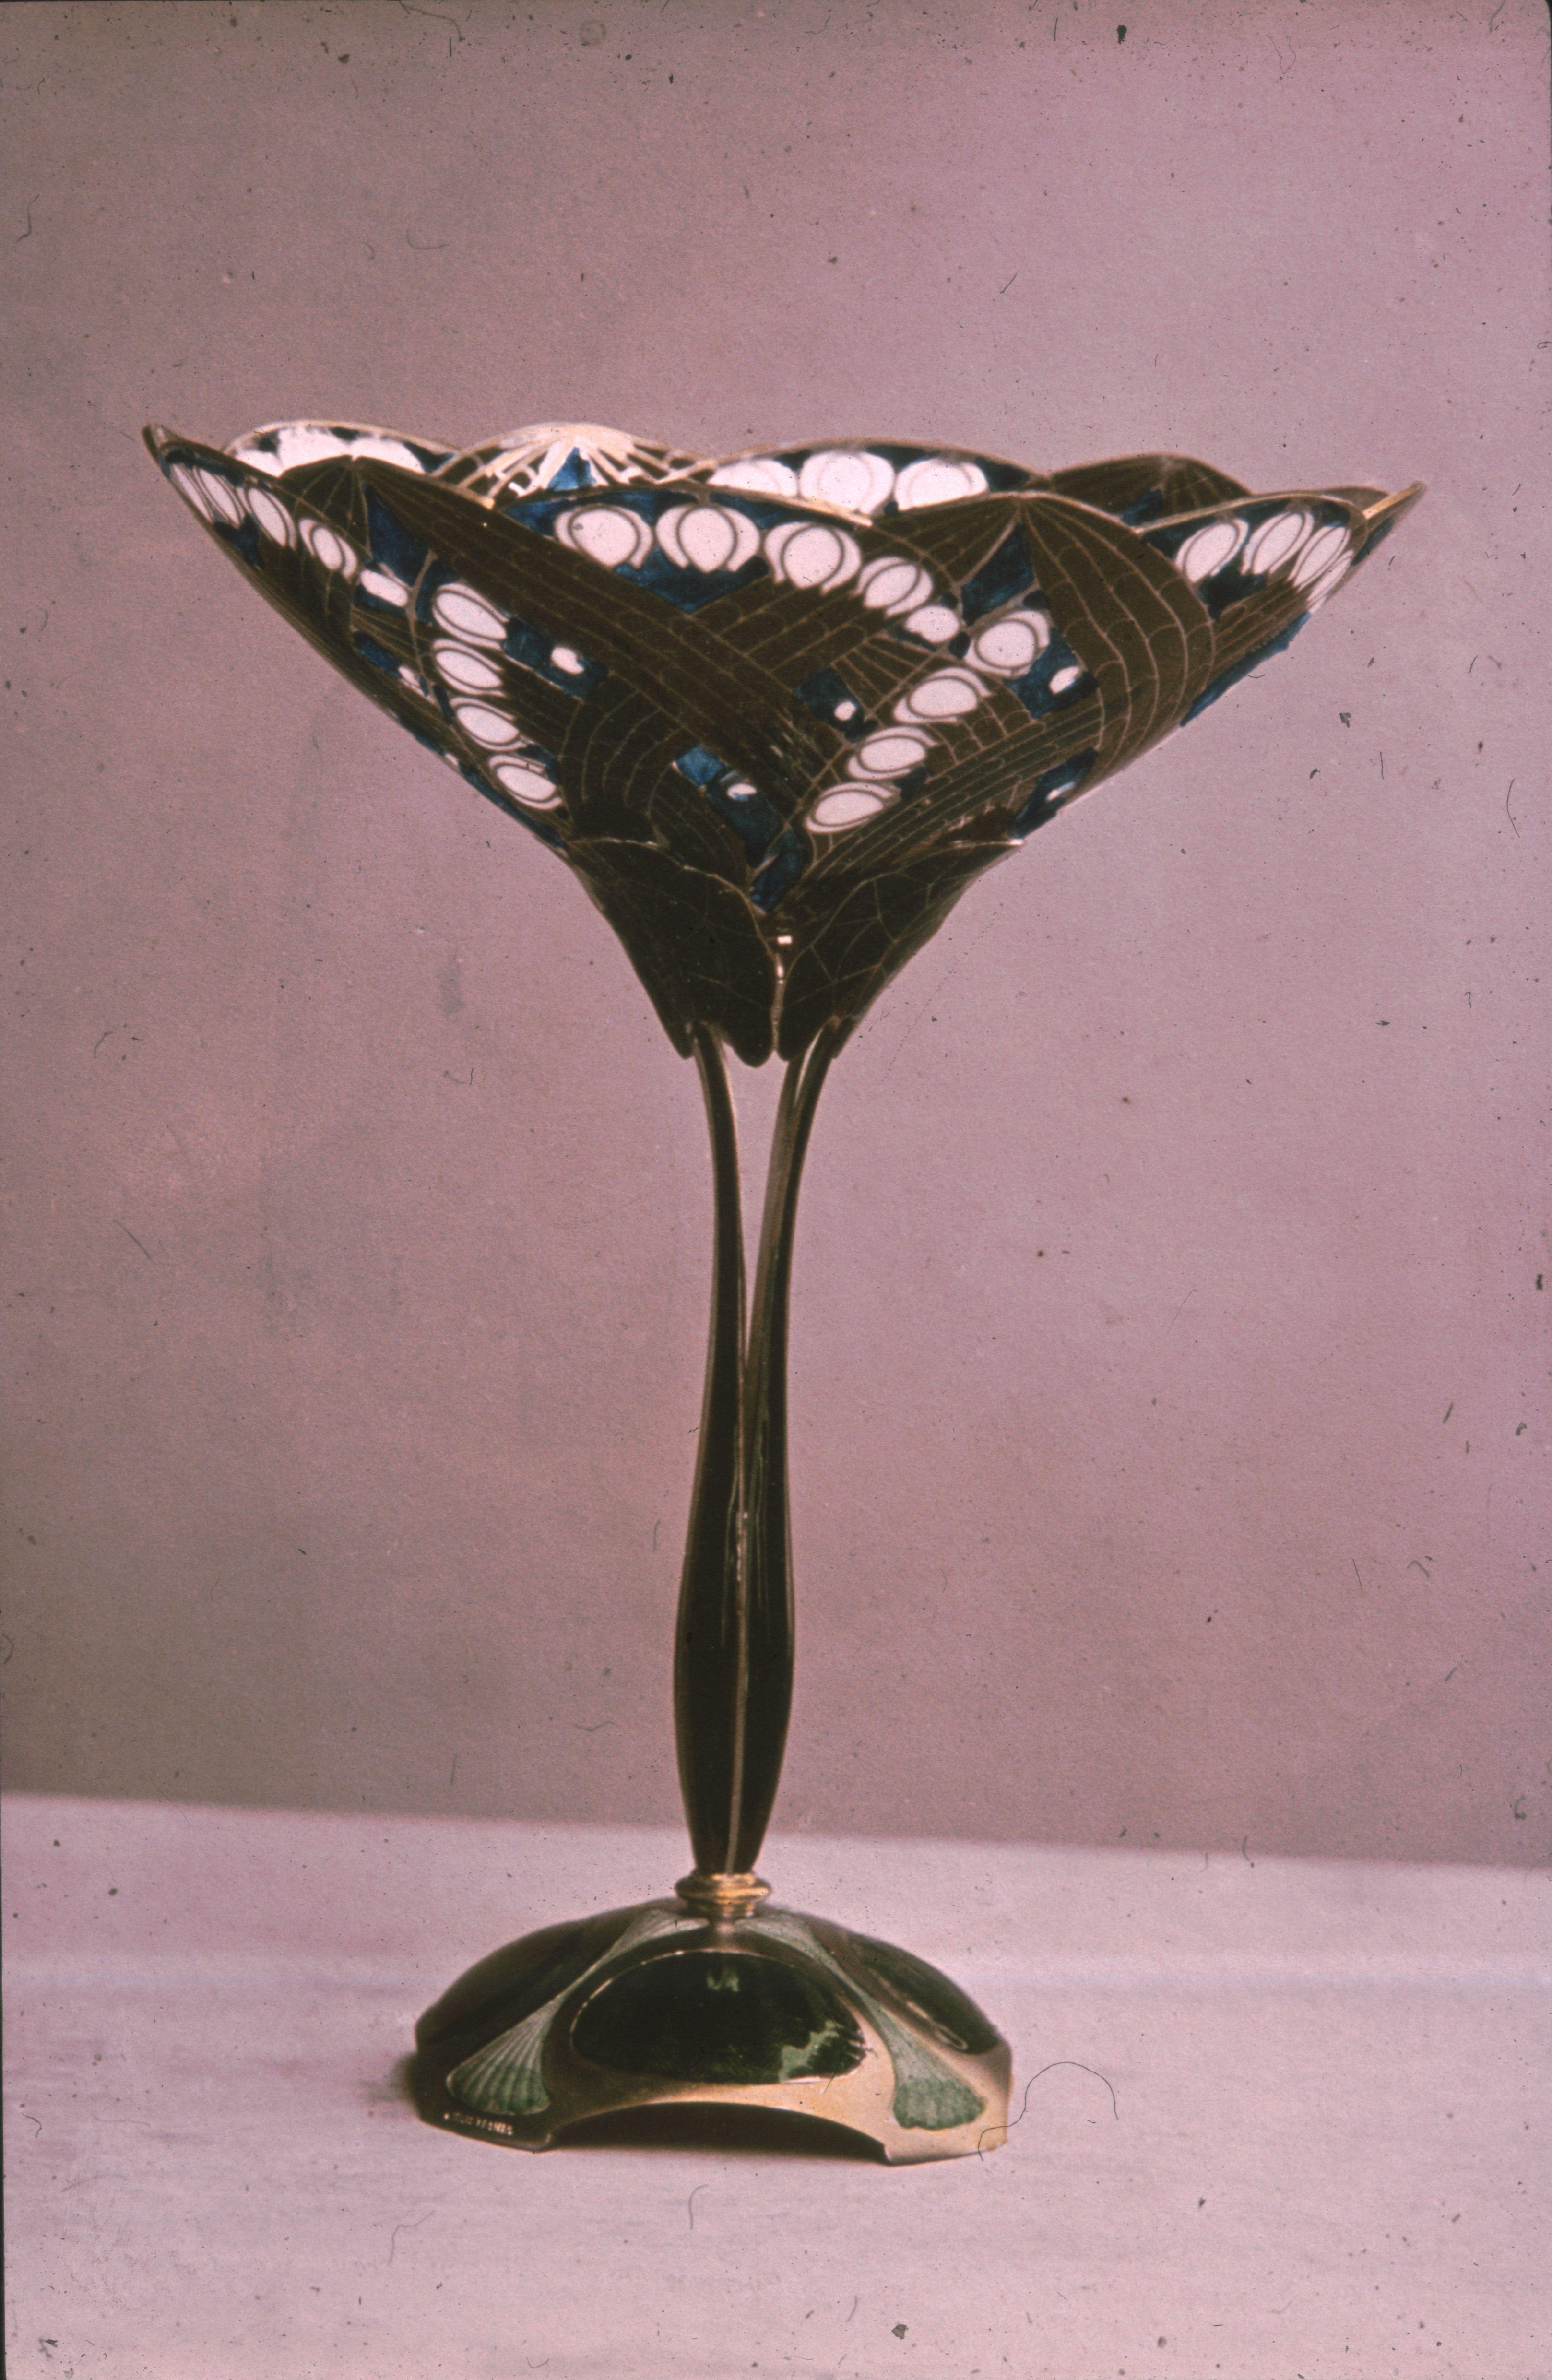 Gustav Gaudernack design for David Andersen of silver gilt decorative vase with plique-a-jour enamel. 1908-1910. Hesssiches Landesmuseum Darmstadt, Germany